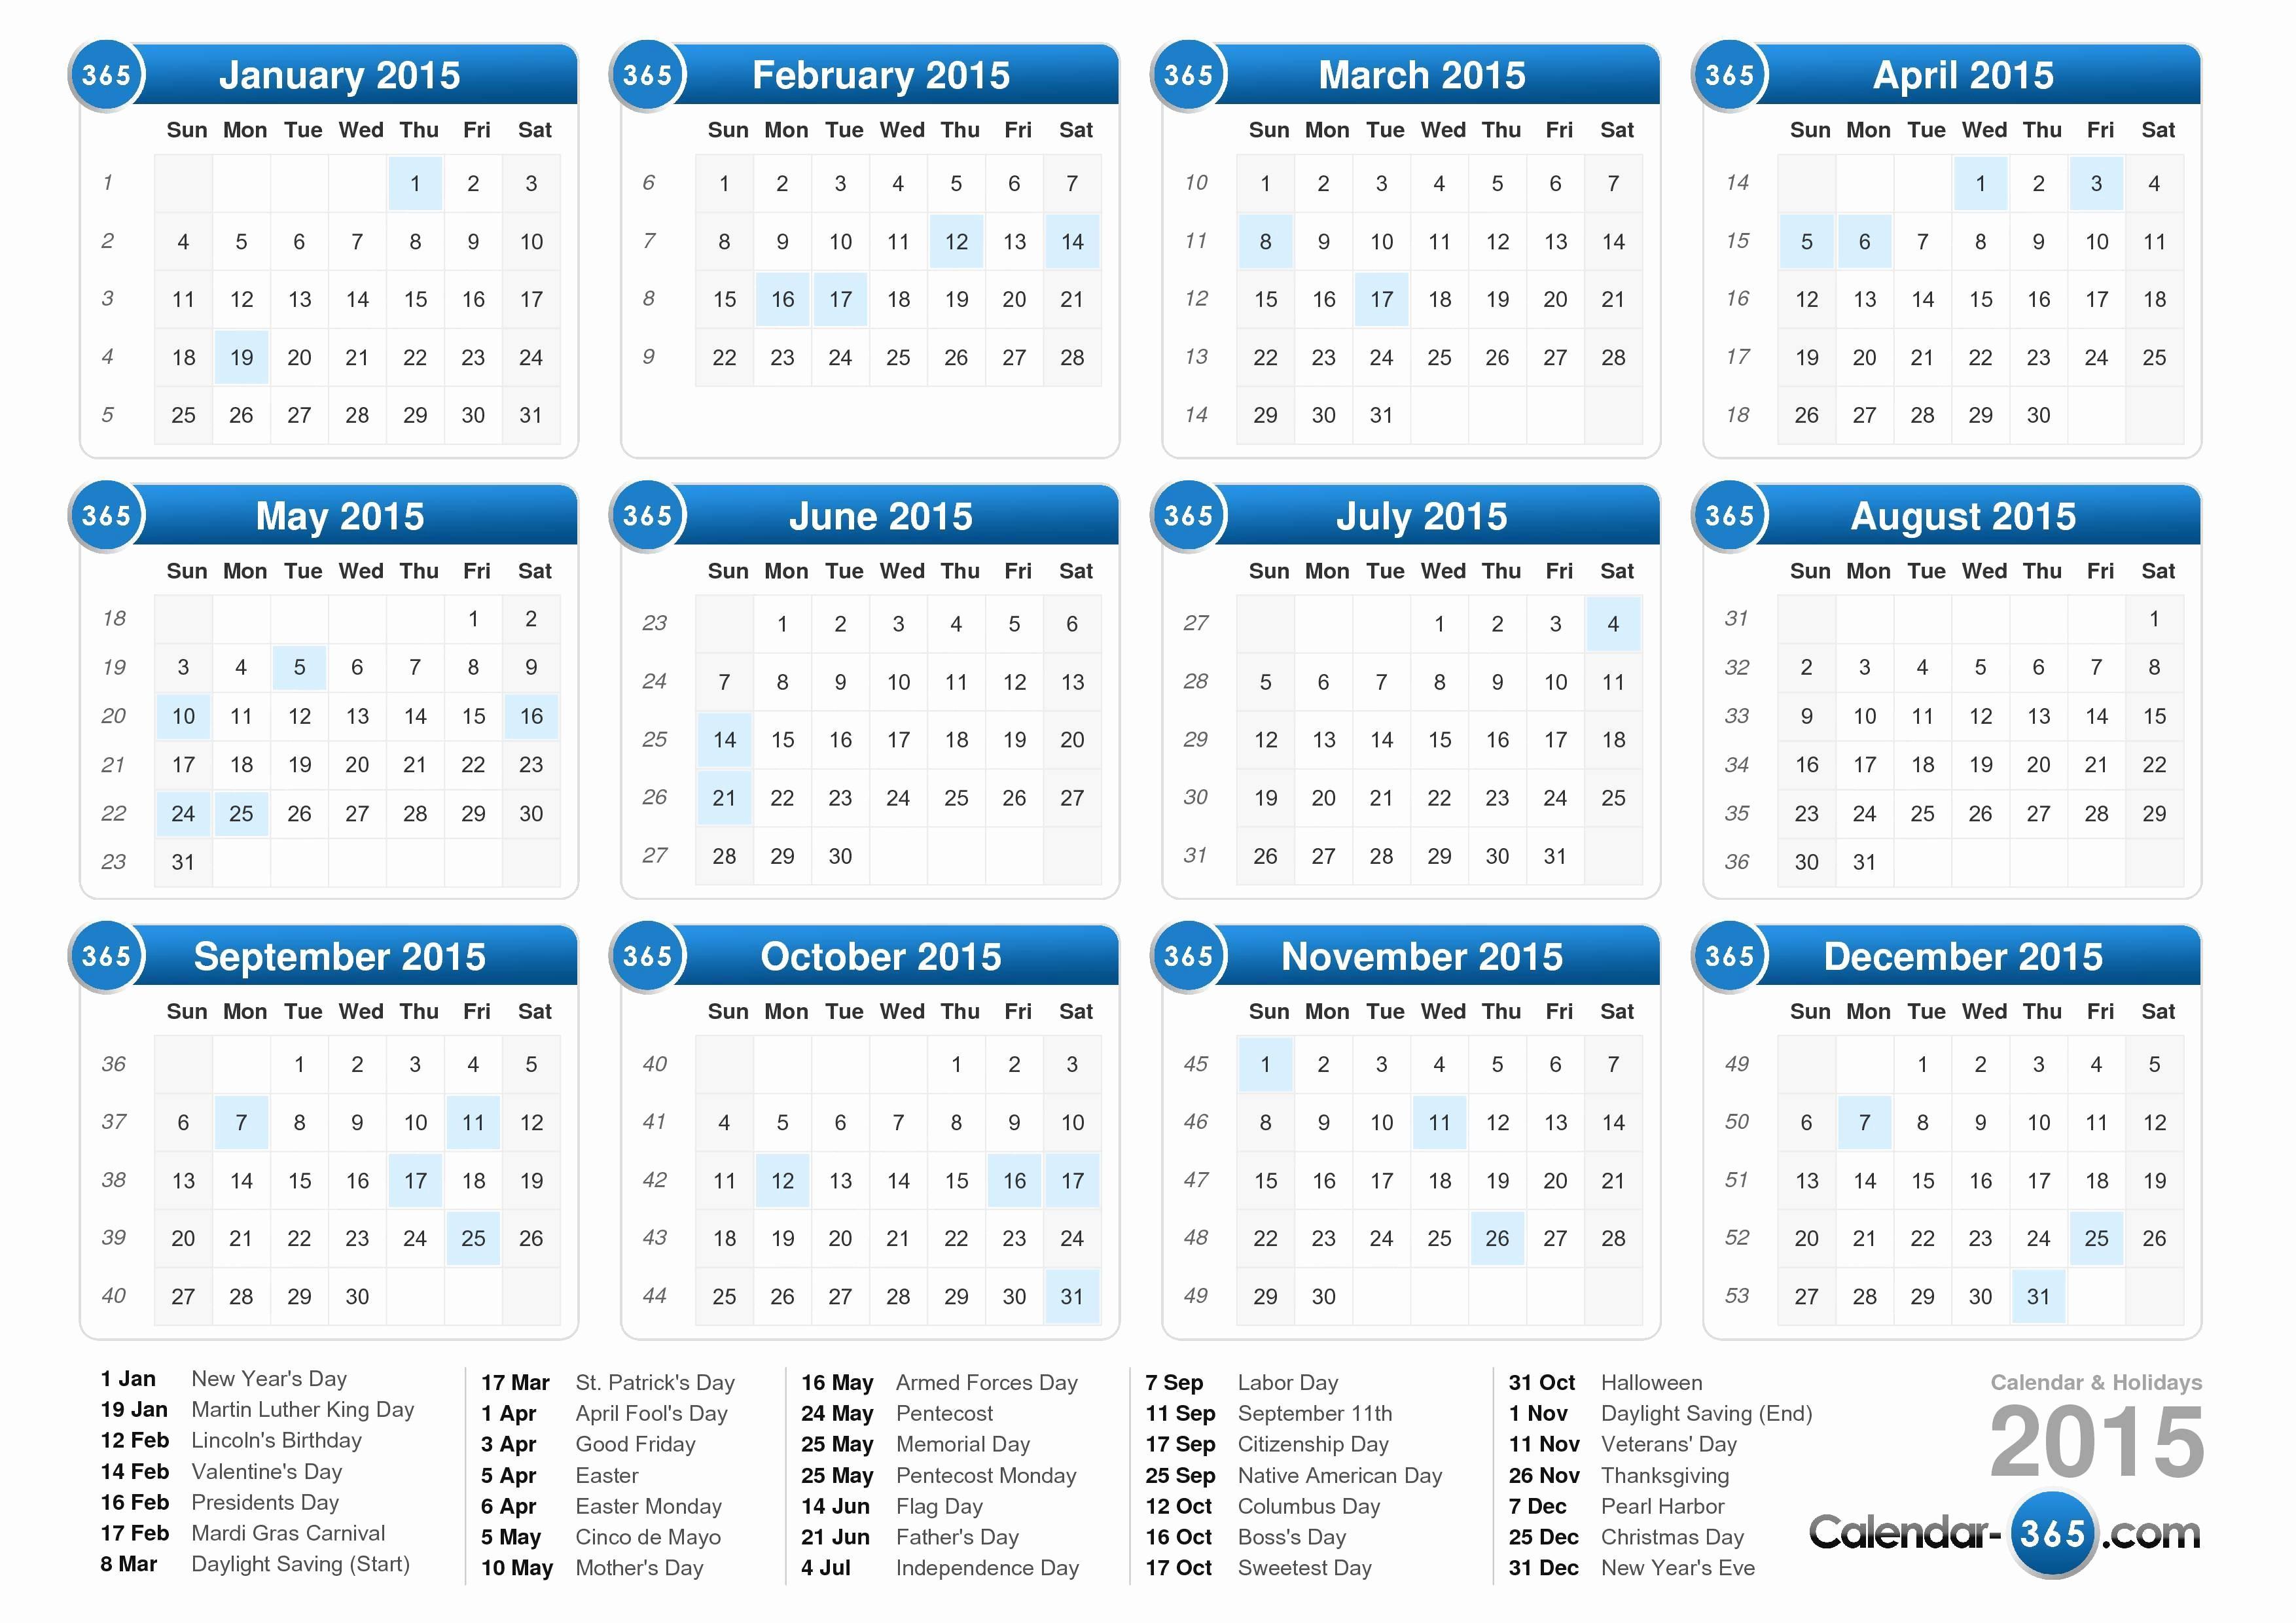 Calendar 2015 Printable with Holidays Elegant 2015 Calendar